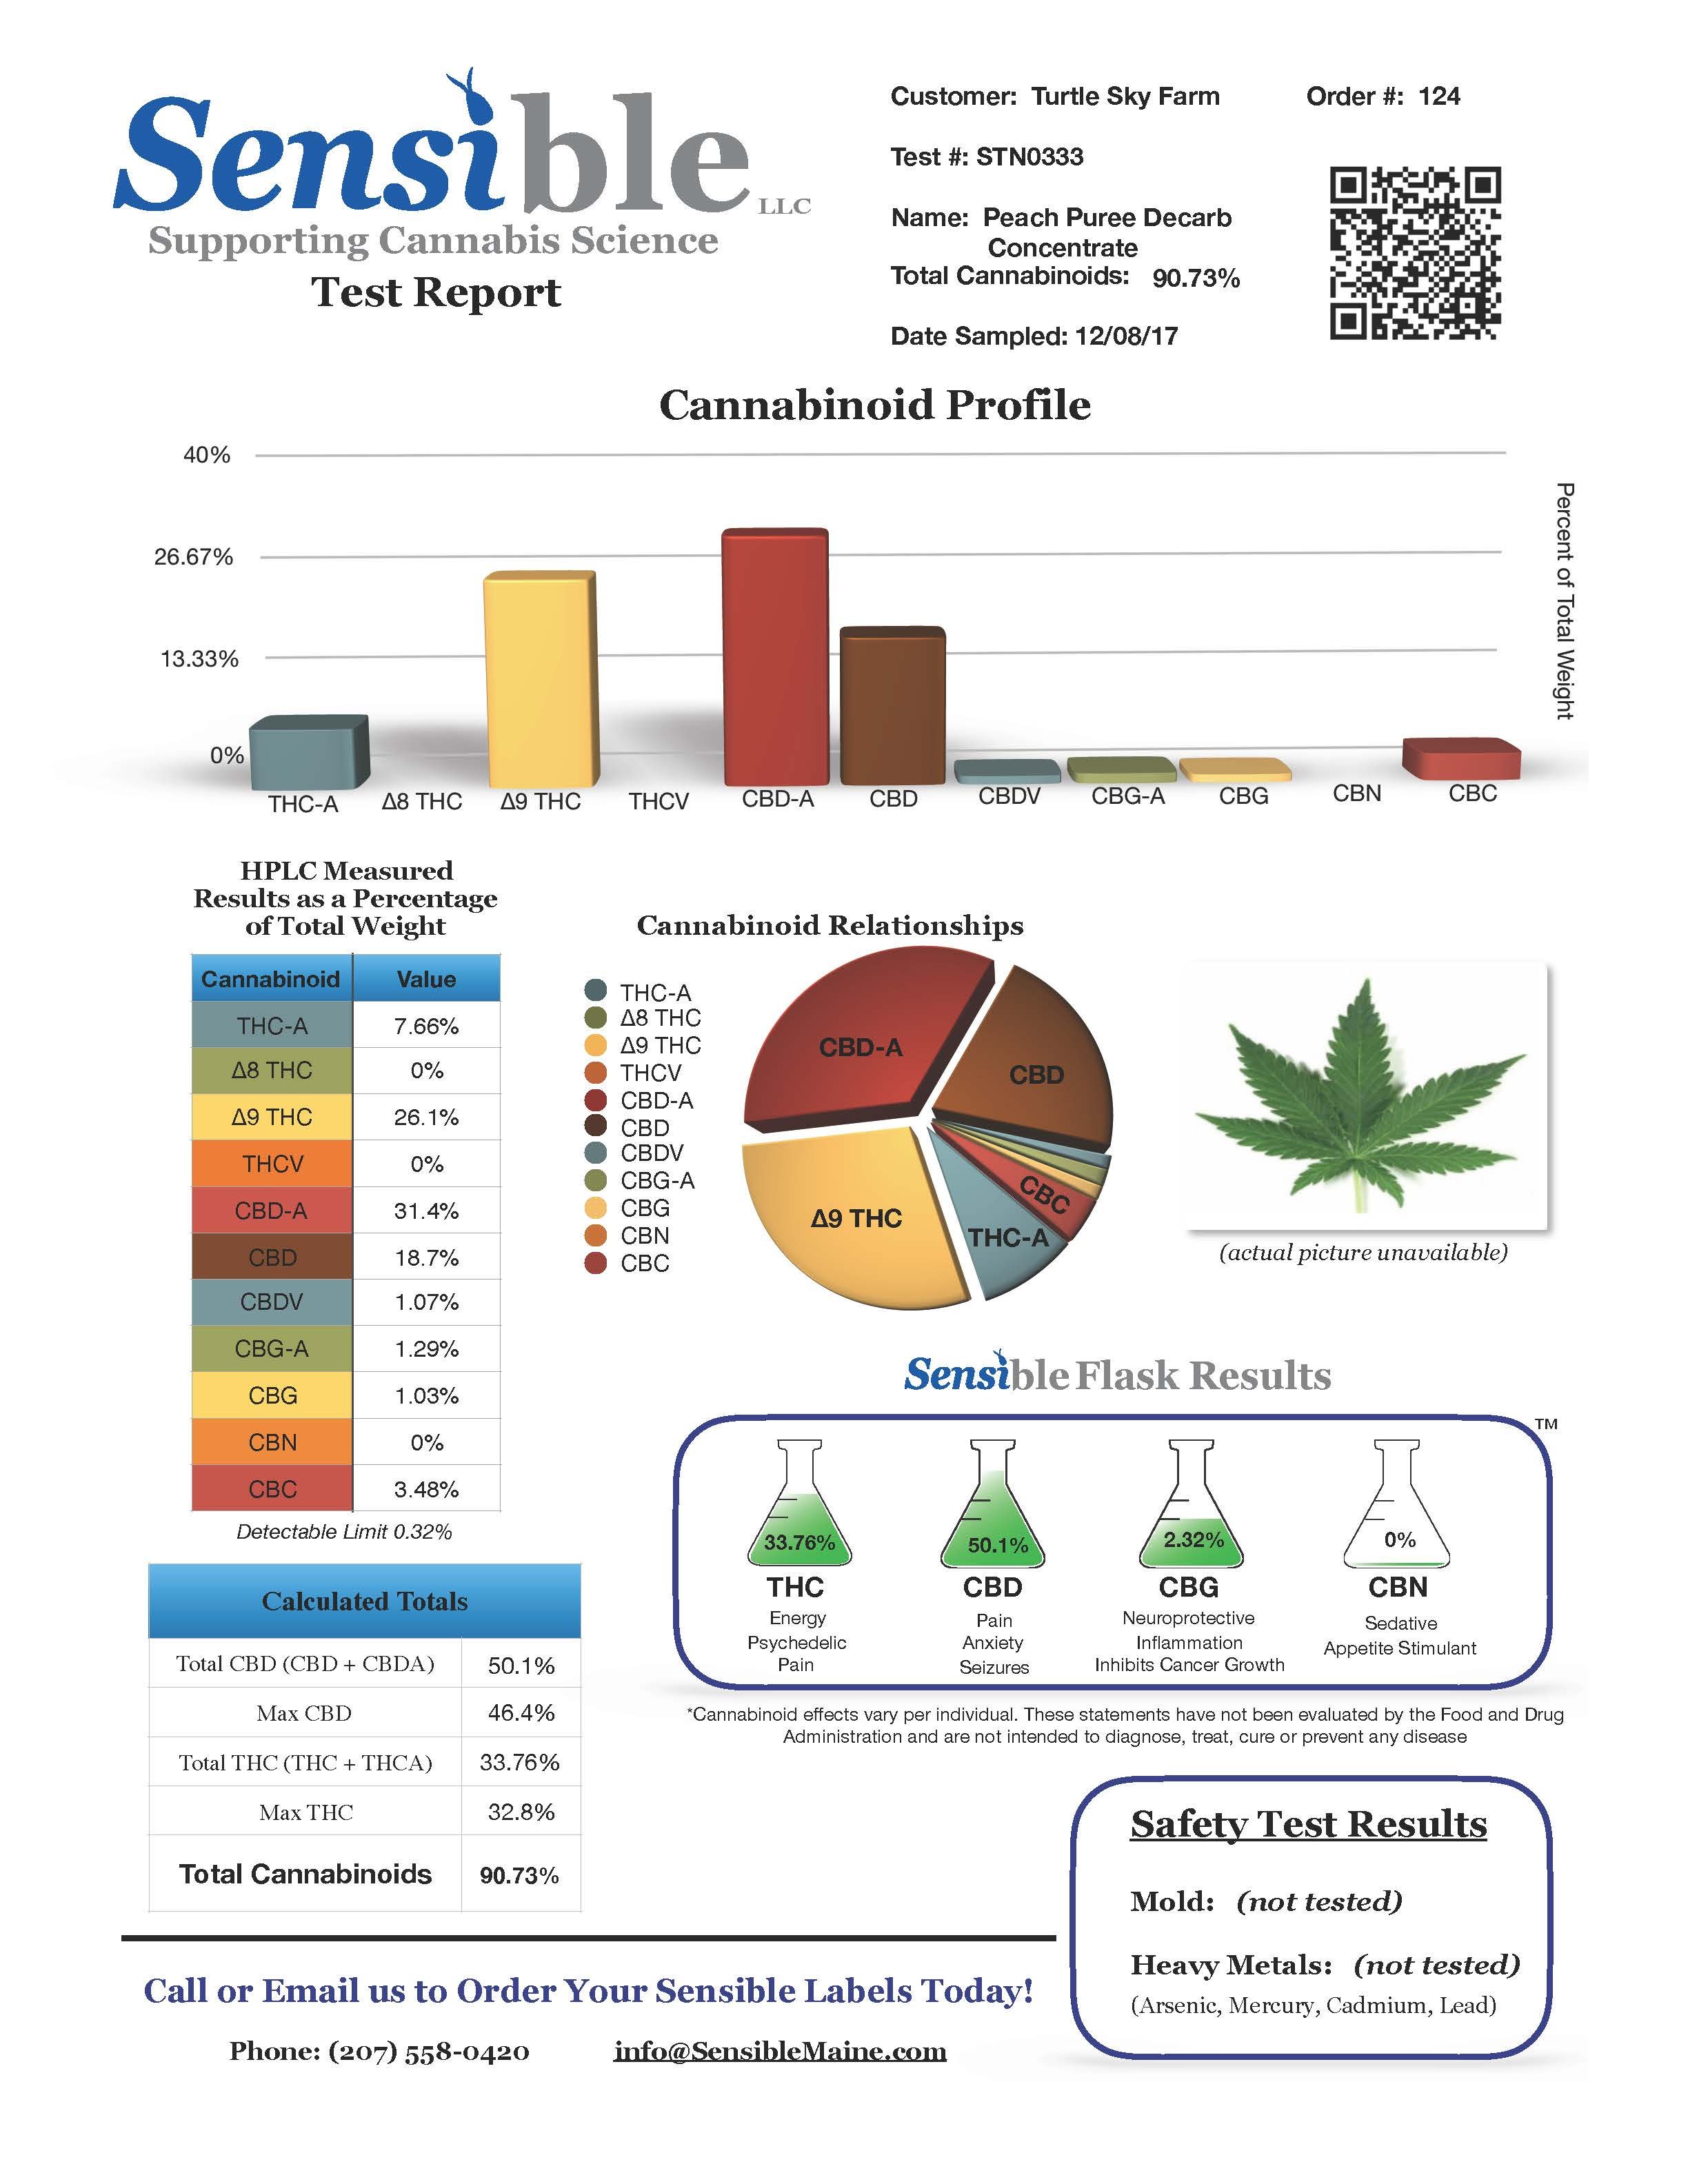 Test Report stn0333.jpg